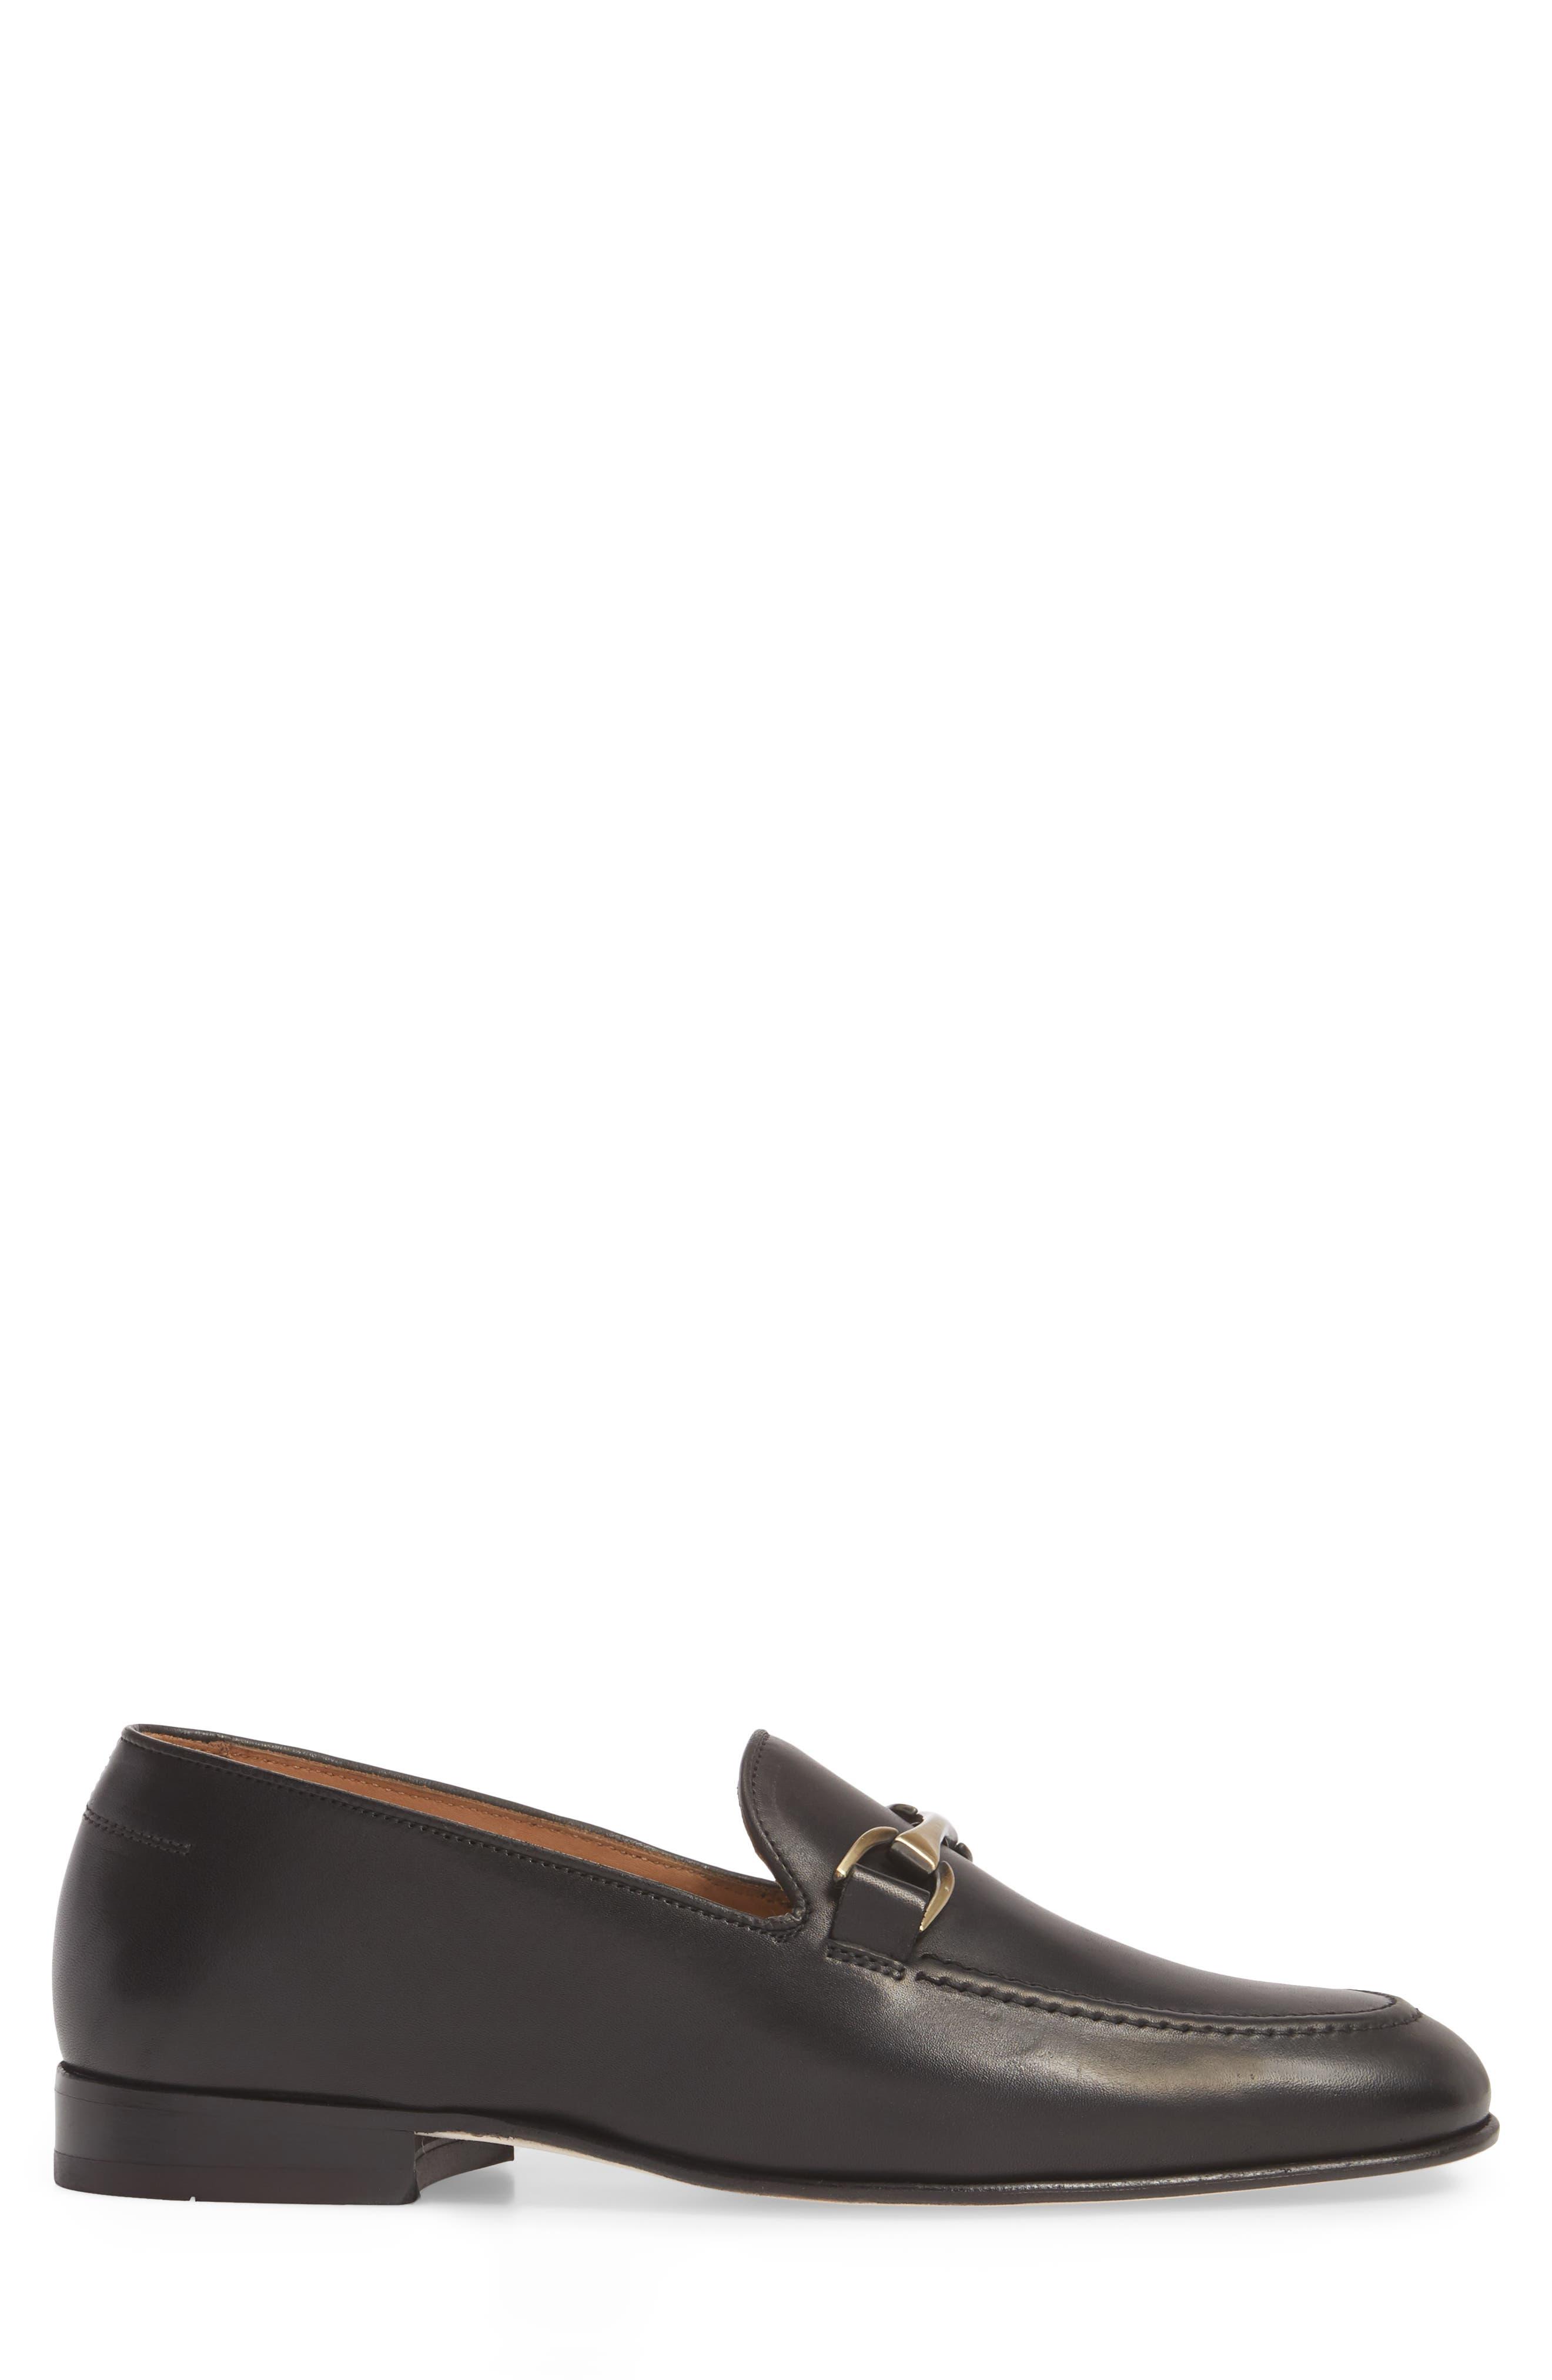 'Borcelo' Bit Loafer,                             Alternate thumbnail 3, color,                             Black Leather